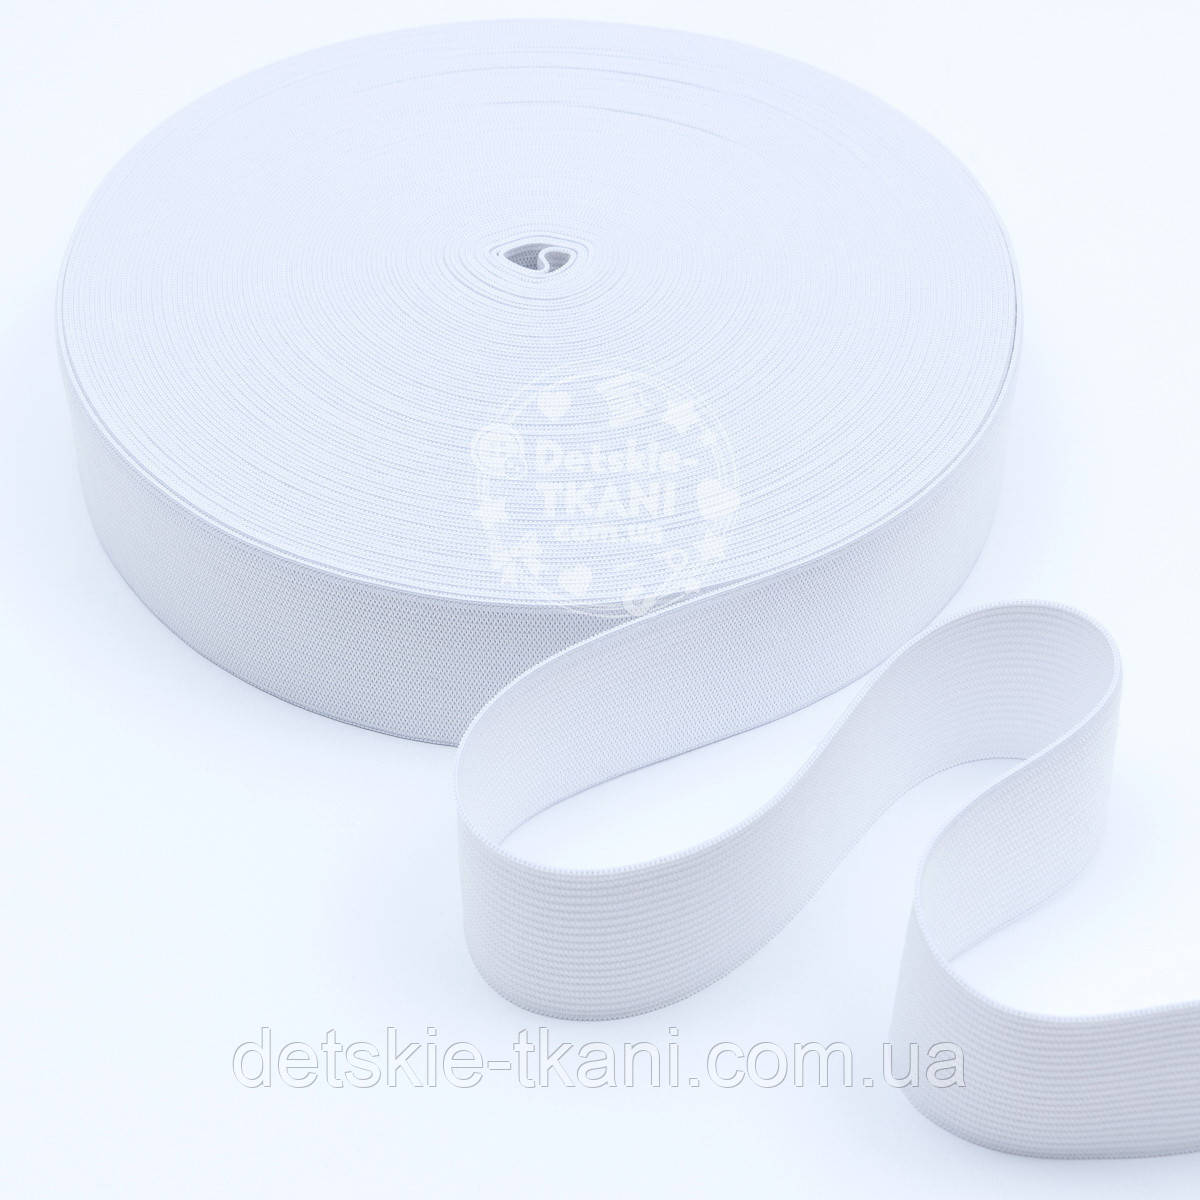 Резинка эластичная, белая, ширина 35 мм.